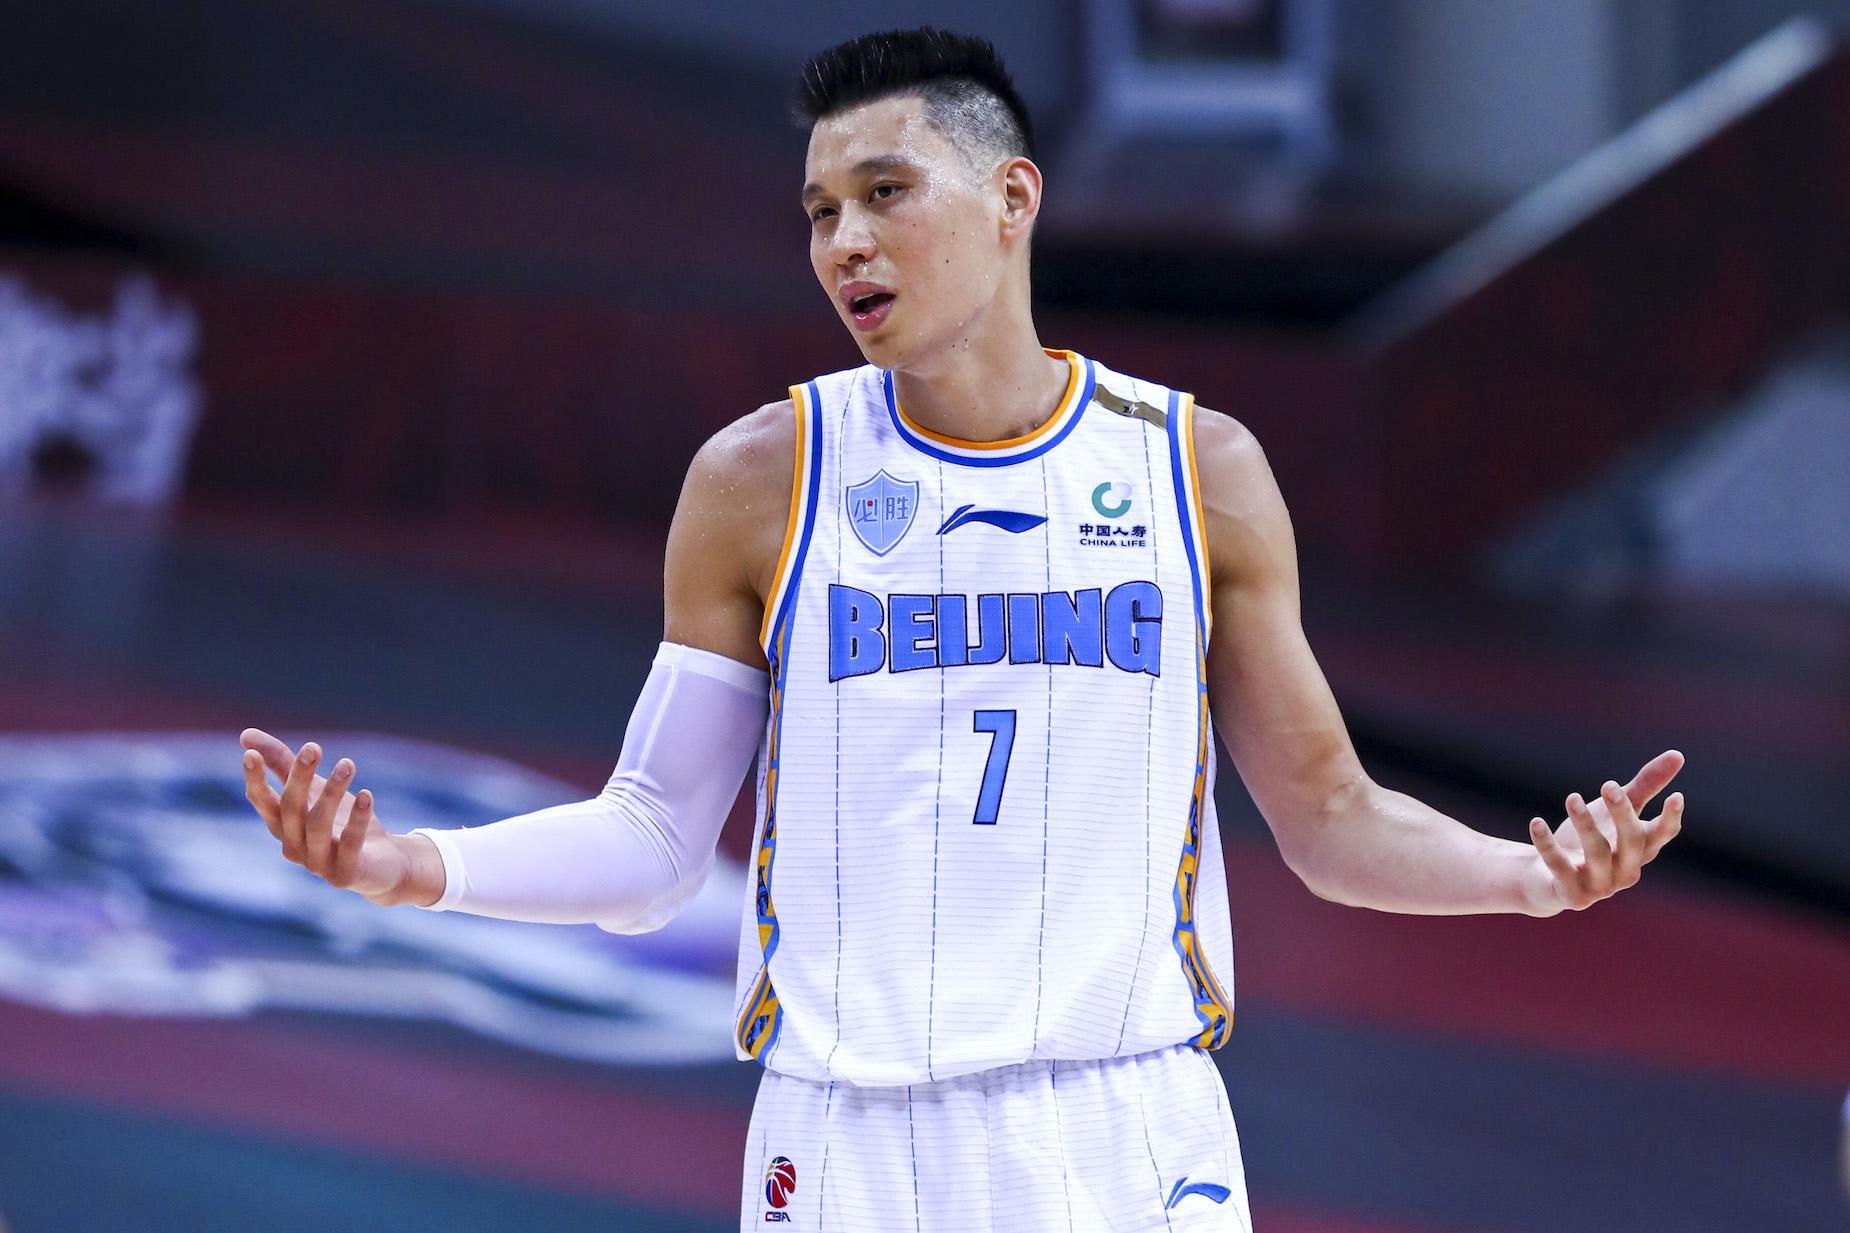 Former NBA star Jeremy Lin on the court for the Beijing Ducks